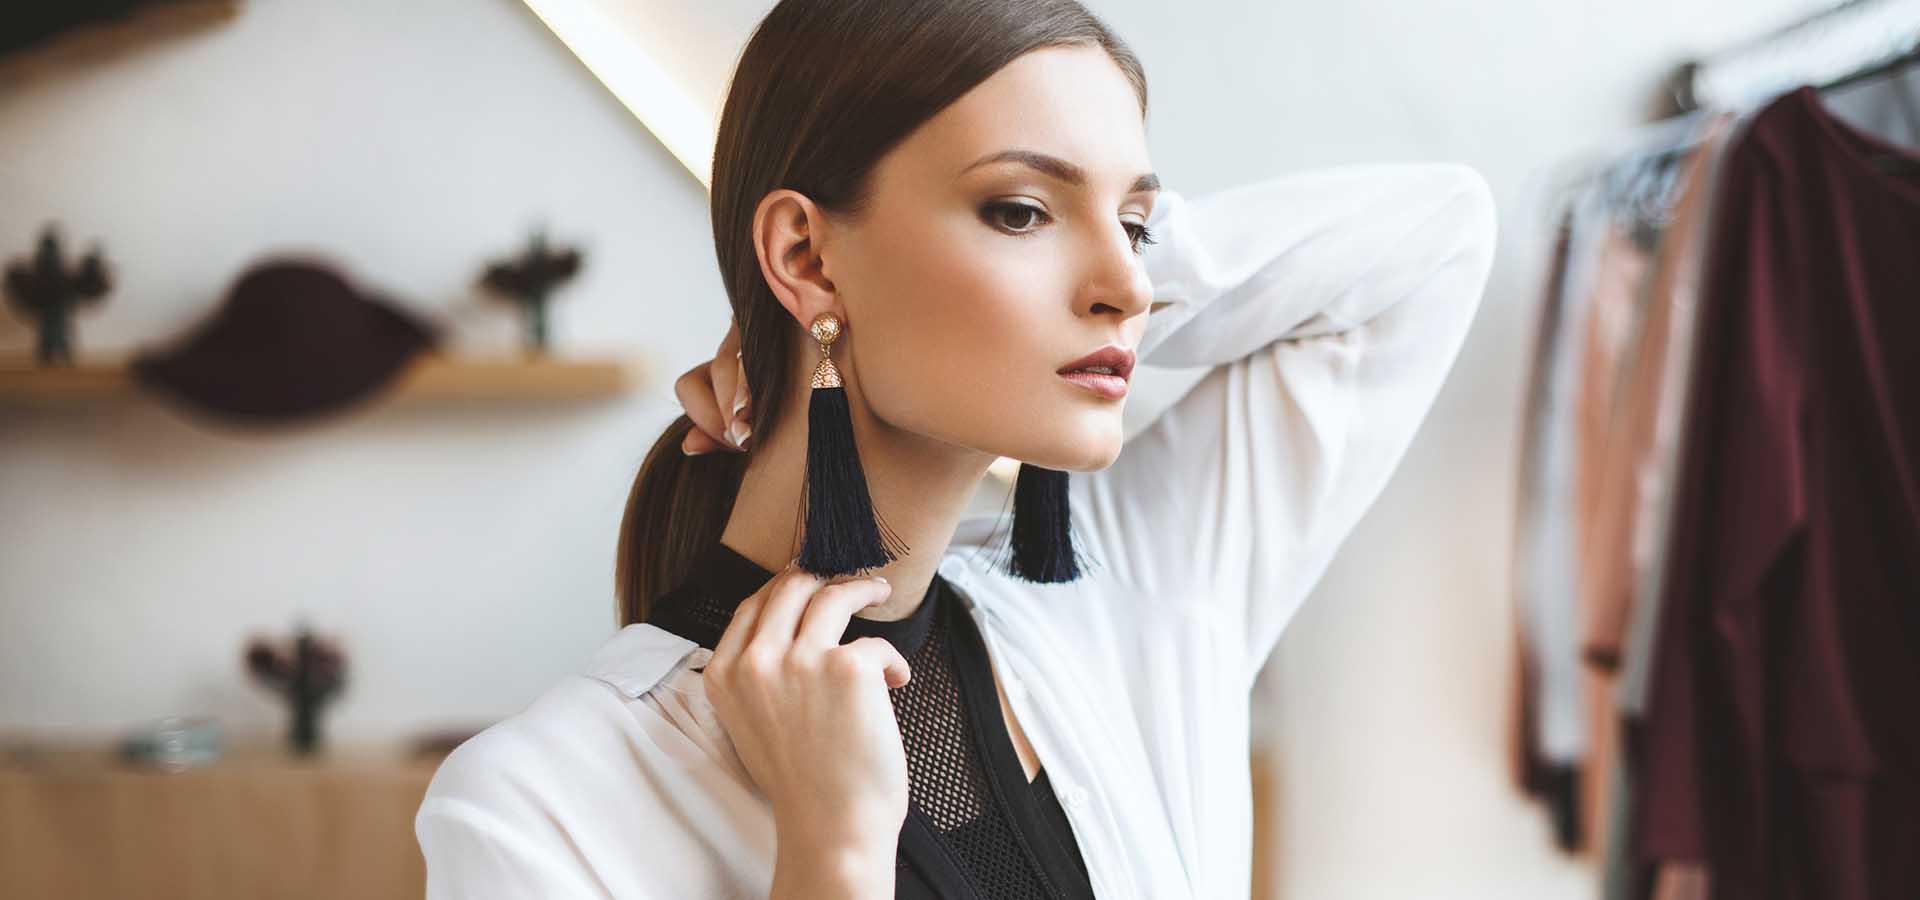 Elegant, beautiful, fashionable woman choosing earrings in boutique.